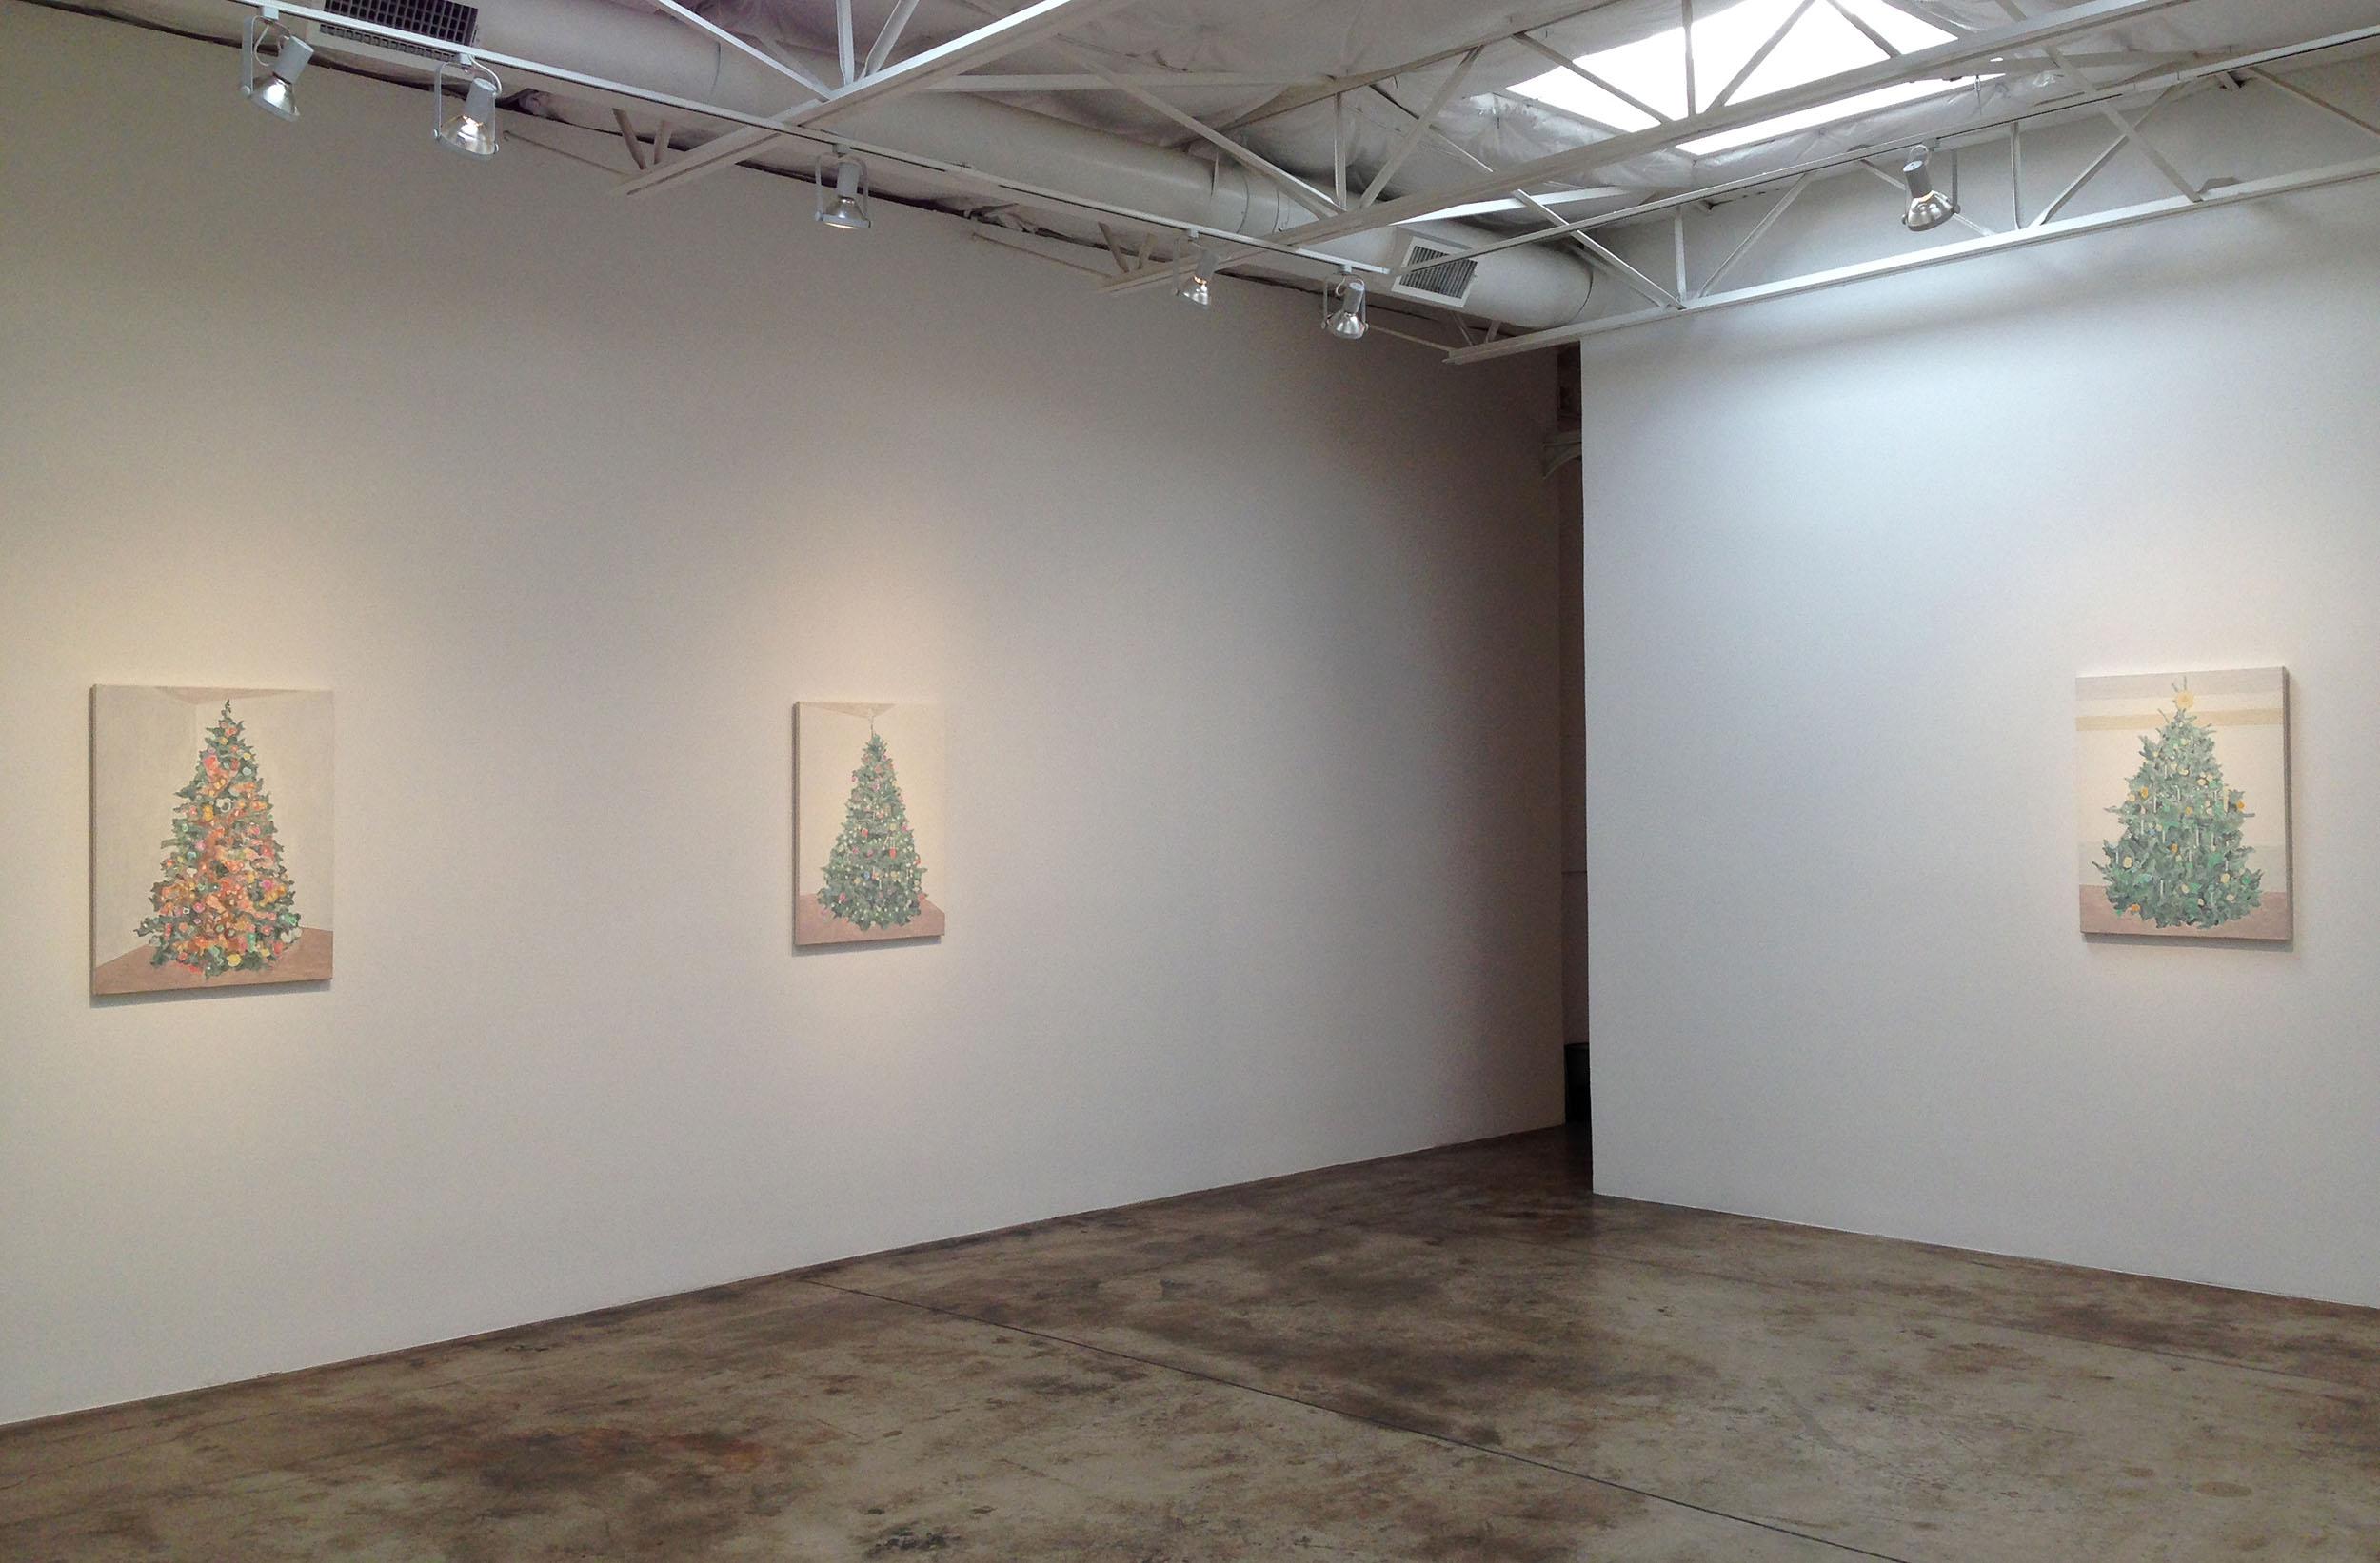 Xmas Trees //  Talley Dunn Gallery, Dallas, TX  // Nov 6 – Dec 19, 2015//